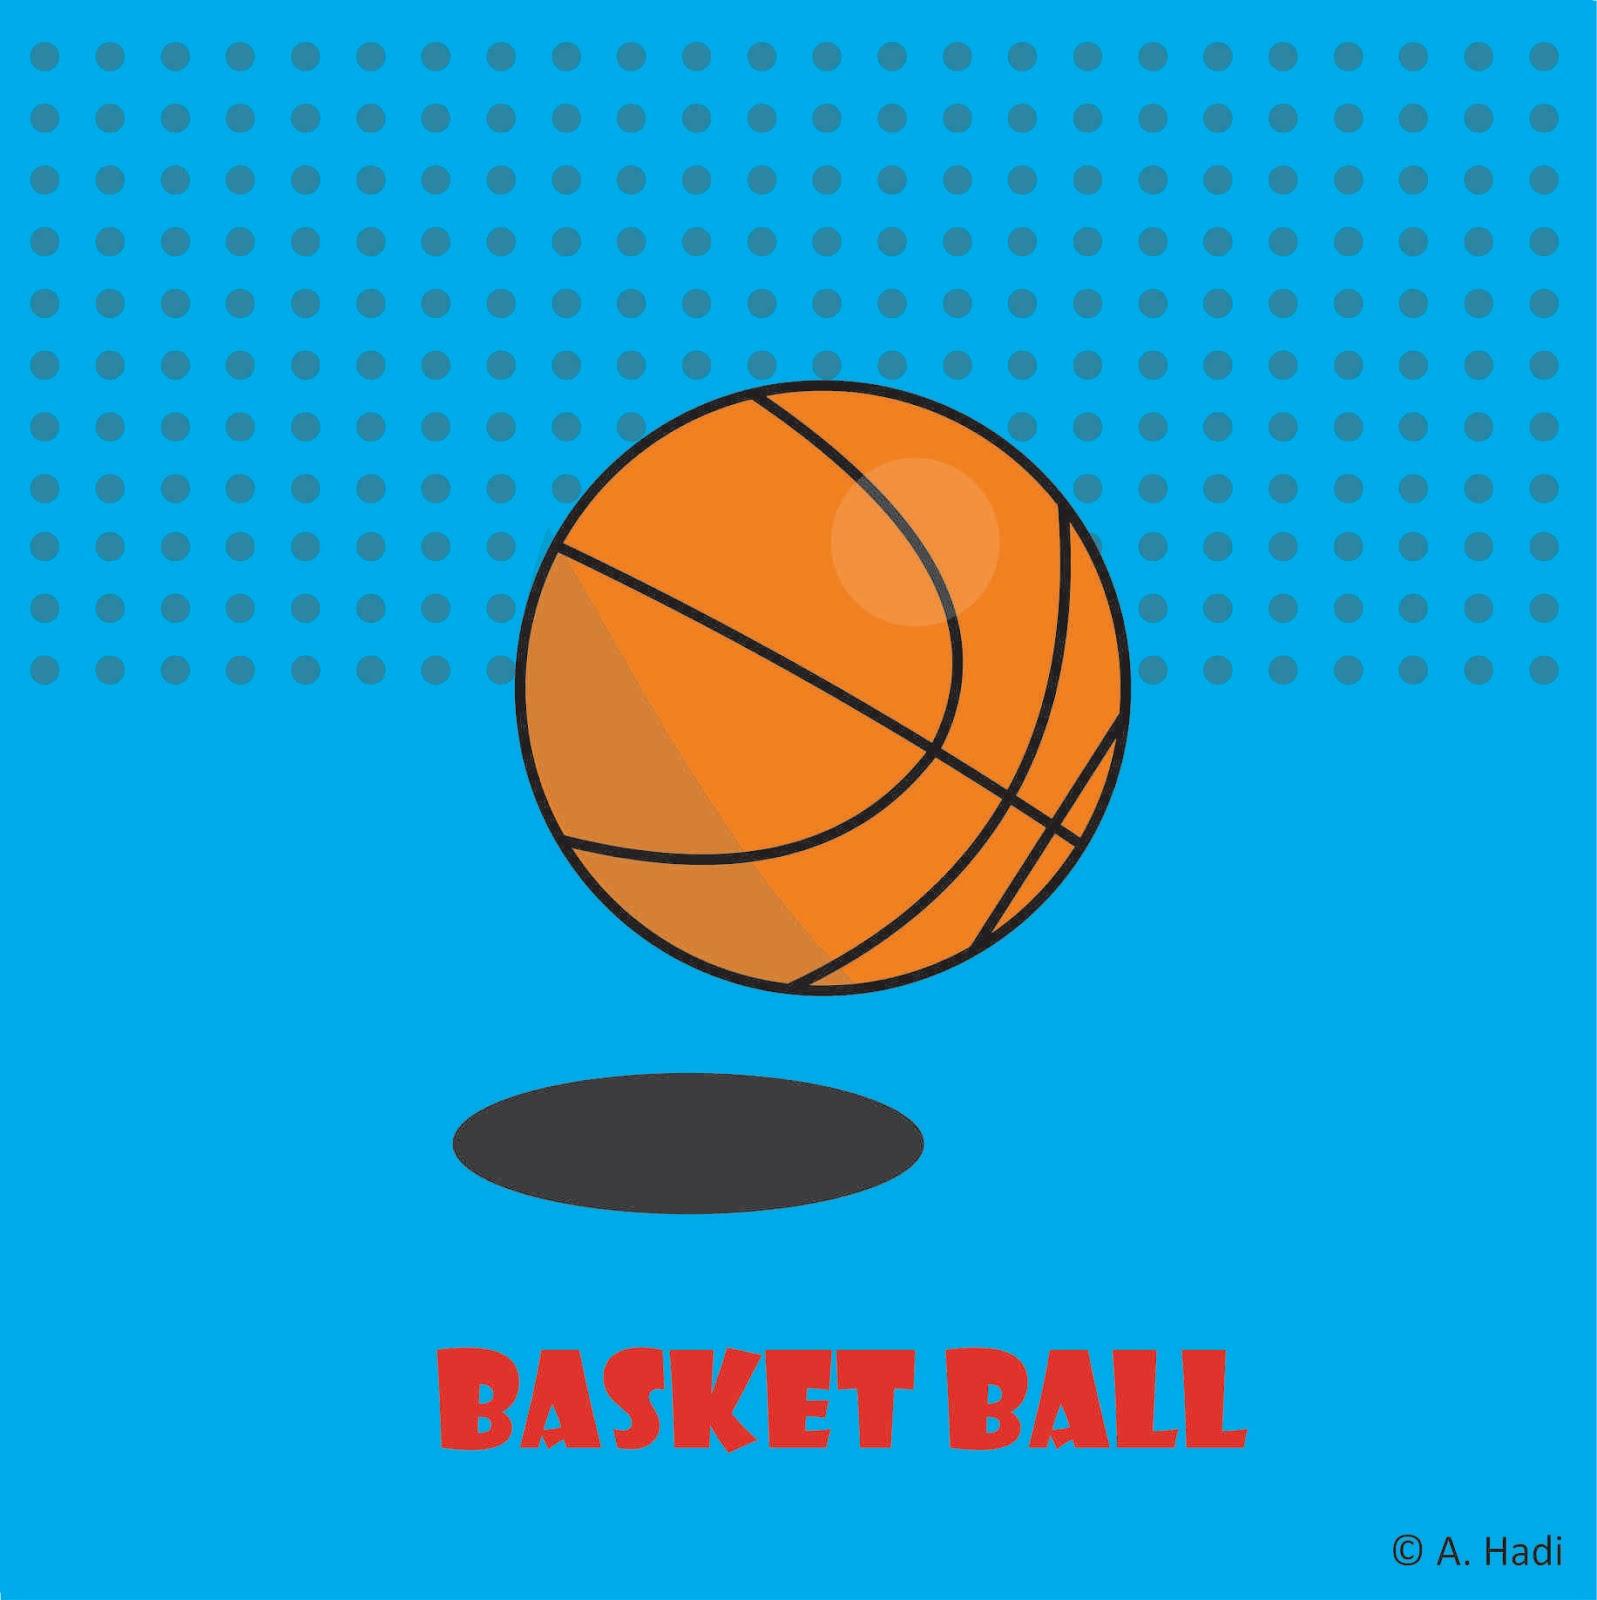 3.basketball artwork